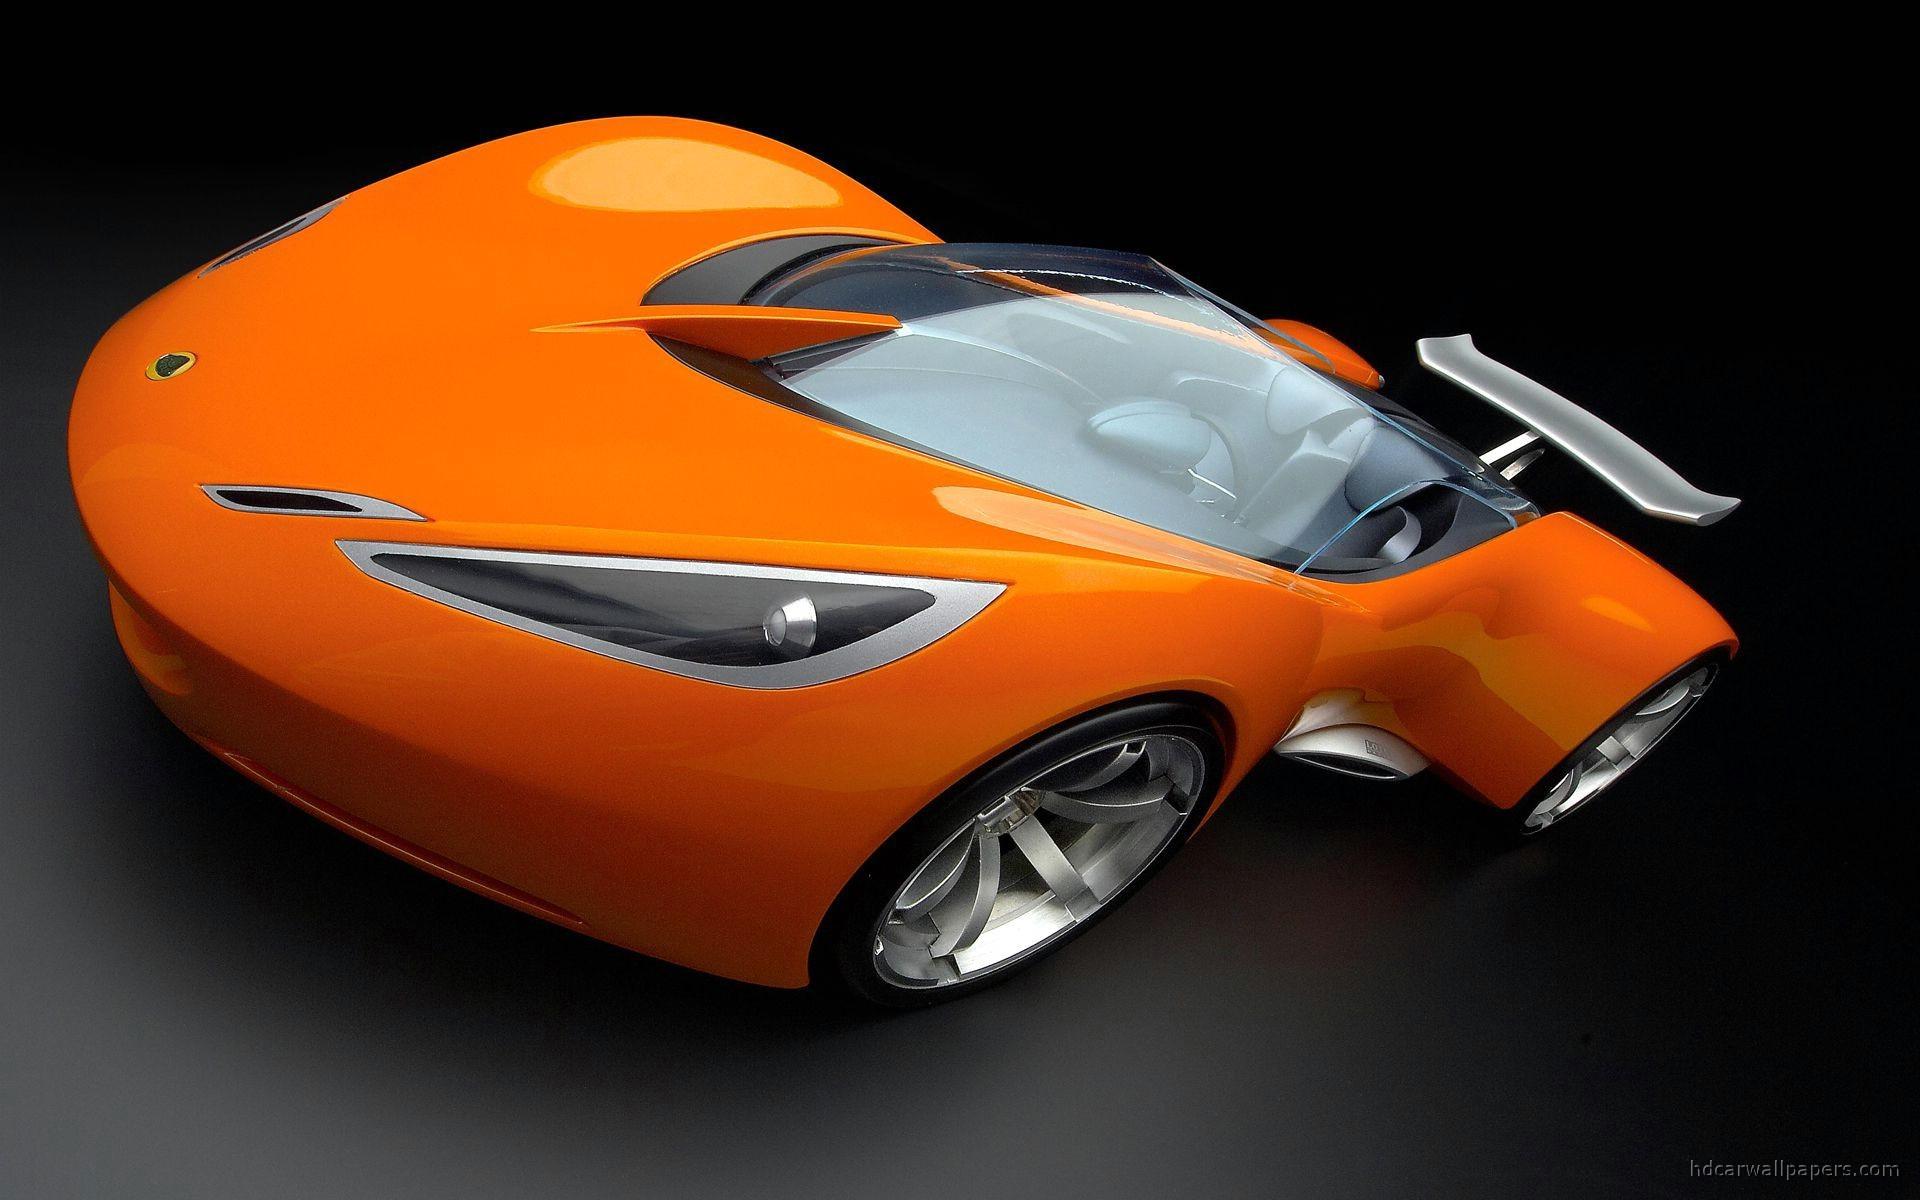 Iphone X Bmw Wallpaper Lotus Hot Wheels Concept 2 Wallpaper Hd Car Wallpapers